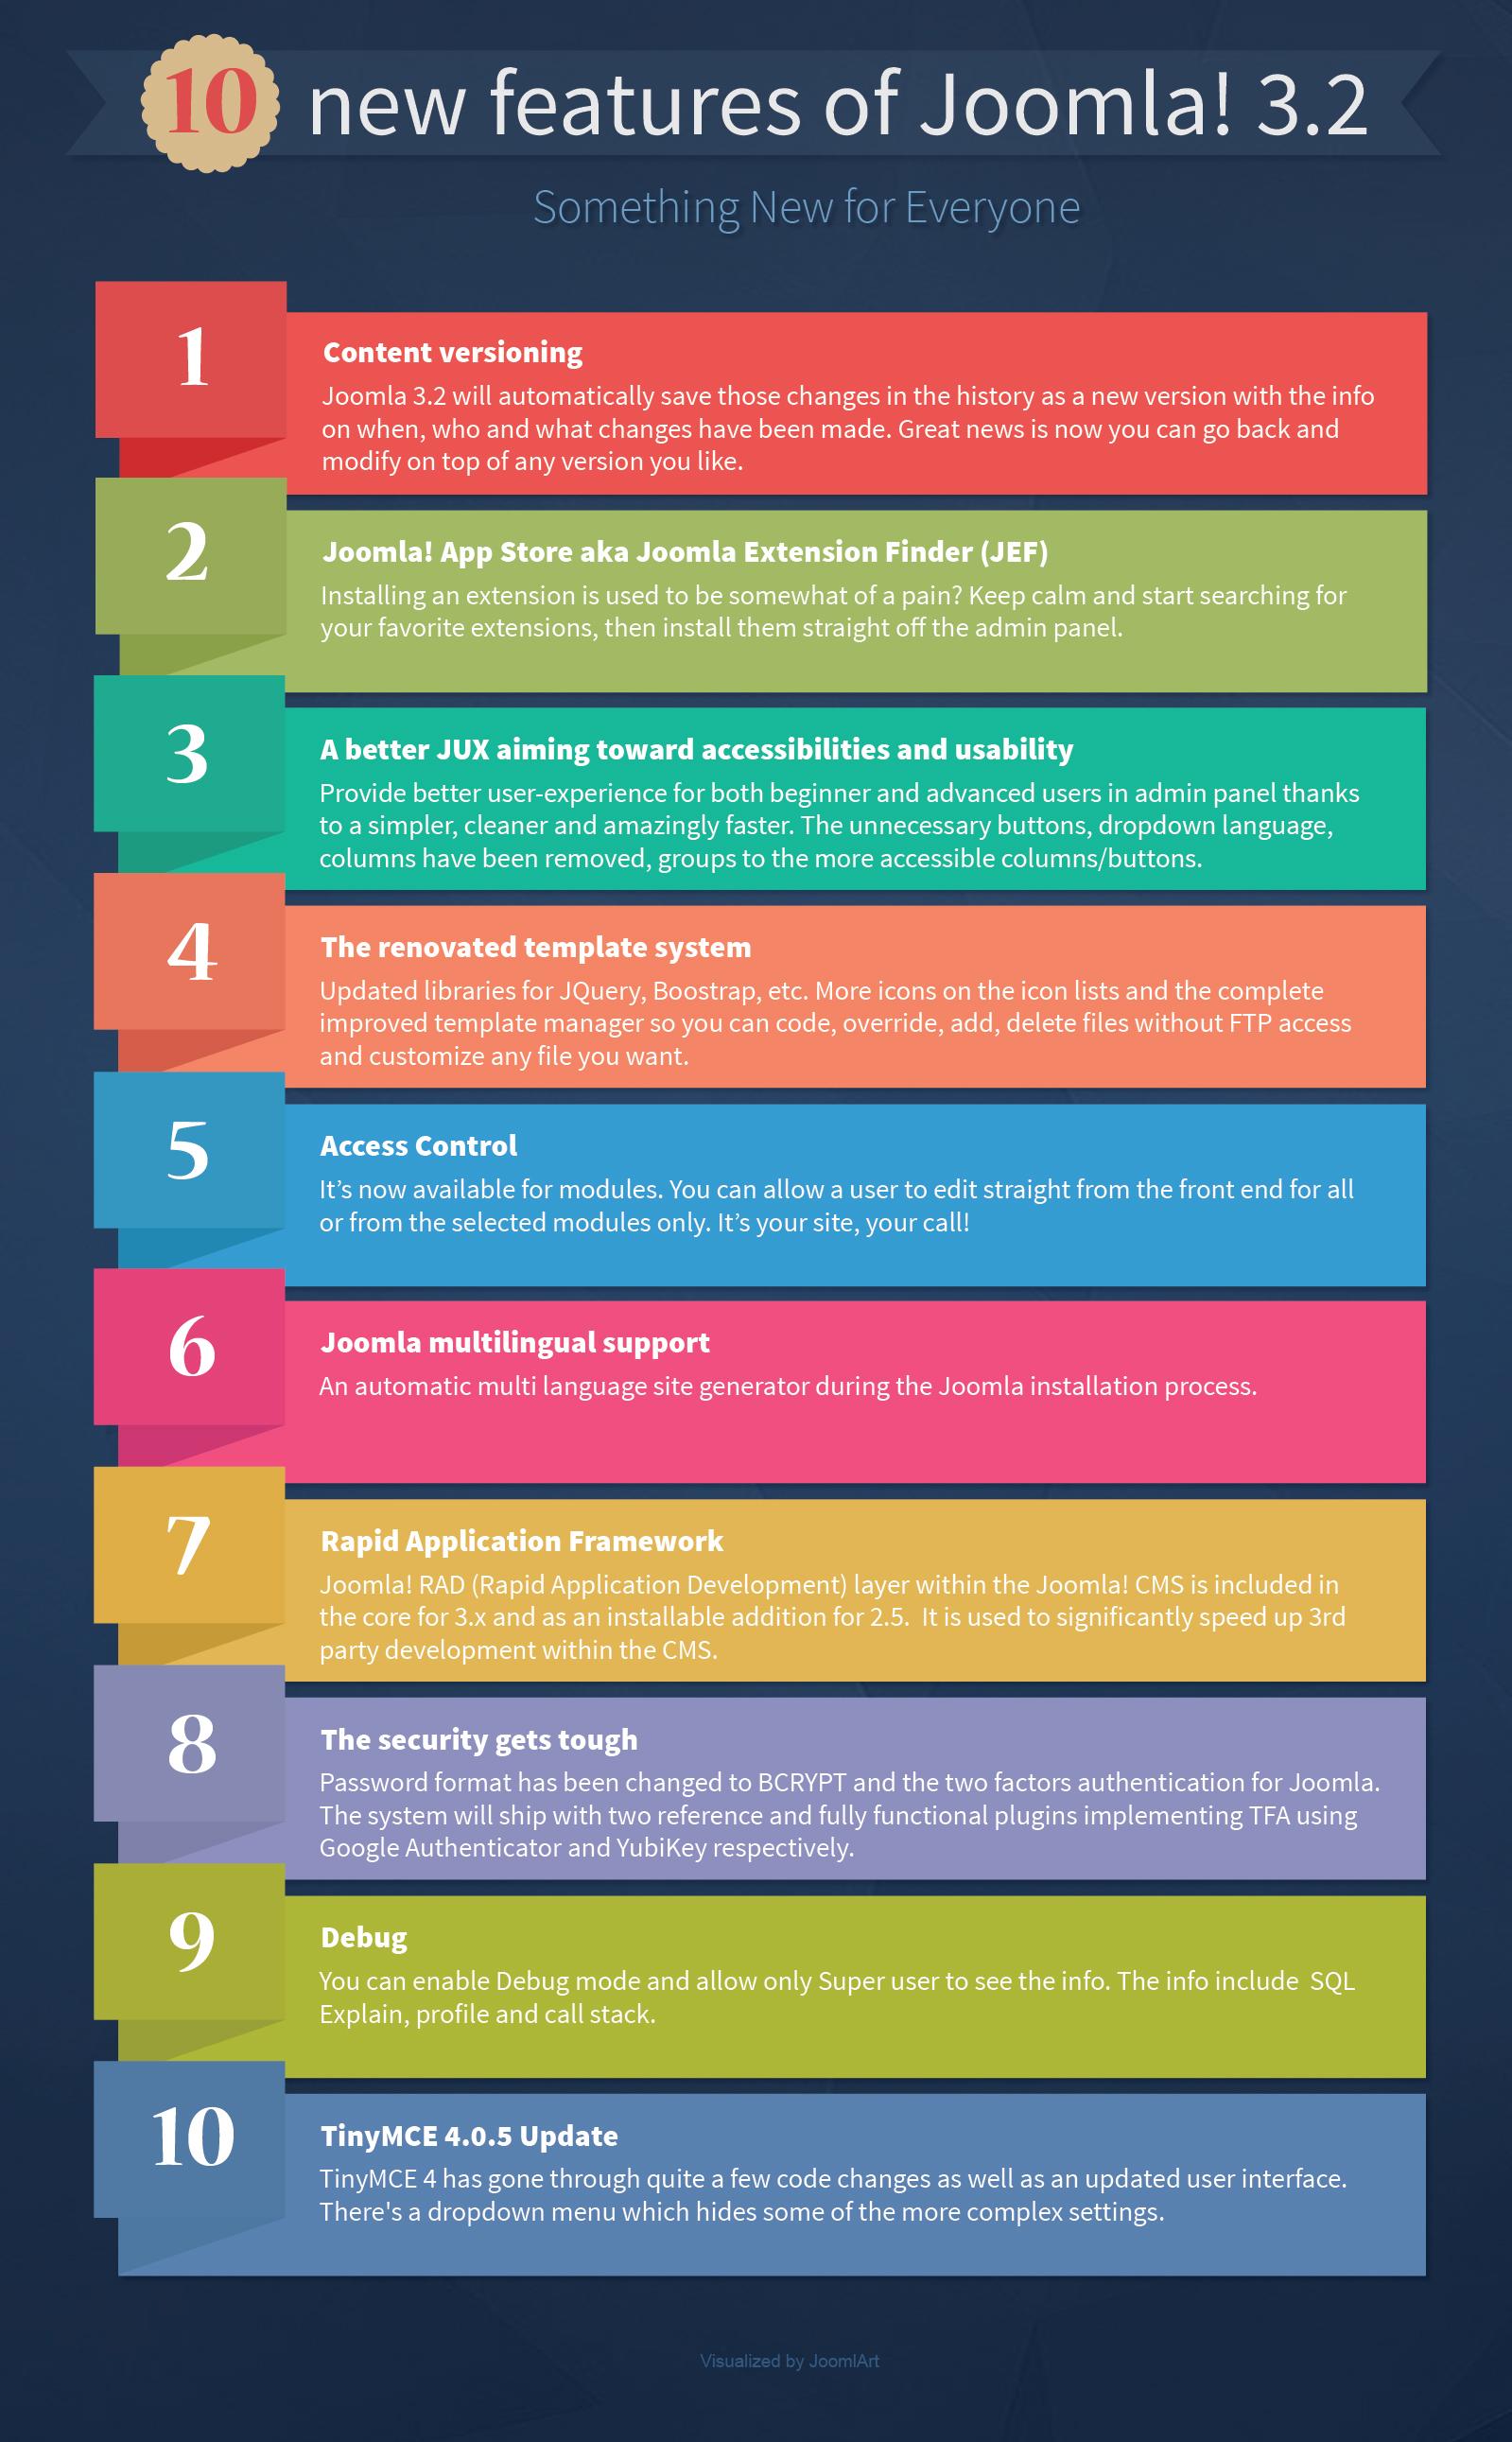 infographic-joomla3.2-1599x2582